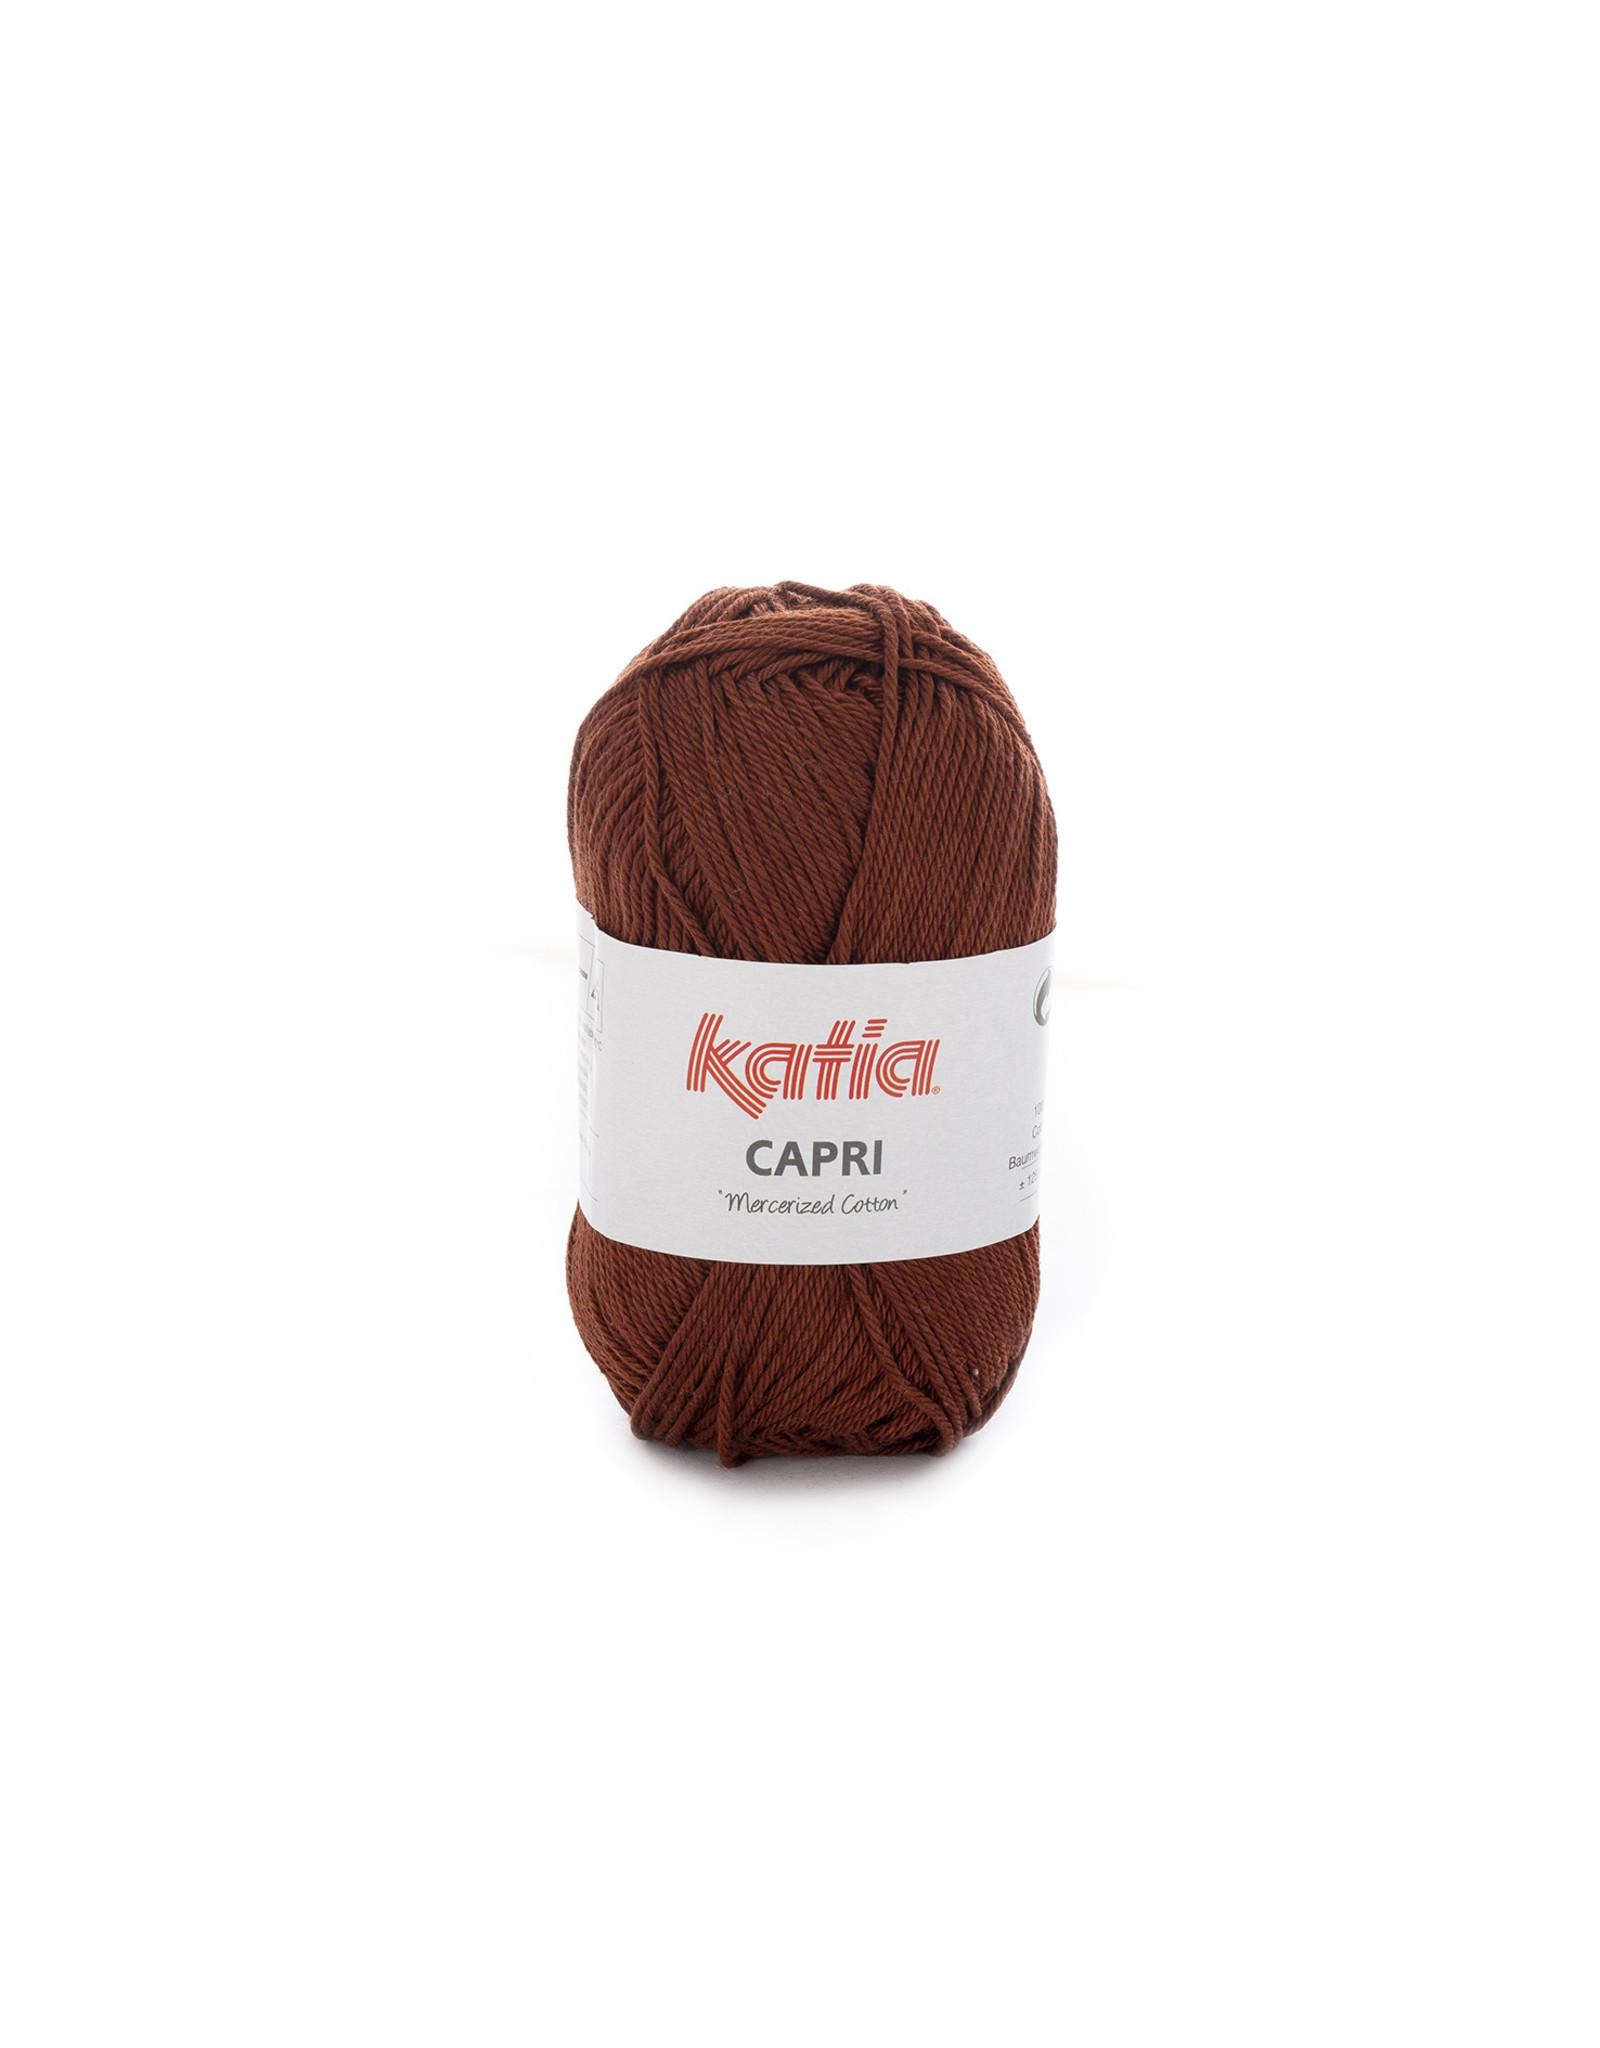 Katia Katia Capri - kleur 162 Koperbruin - bundel 5 x 50 gr. / 125 m. - 100% katoen